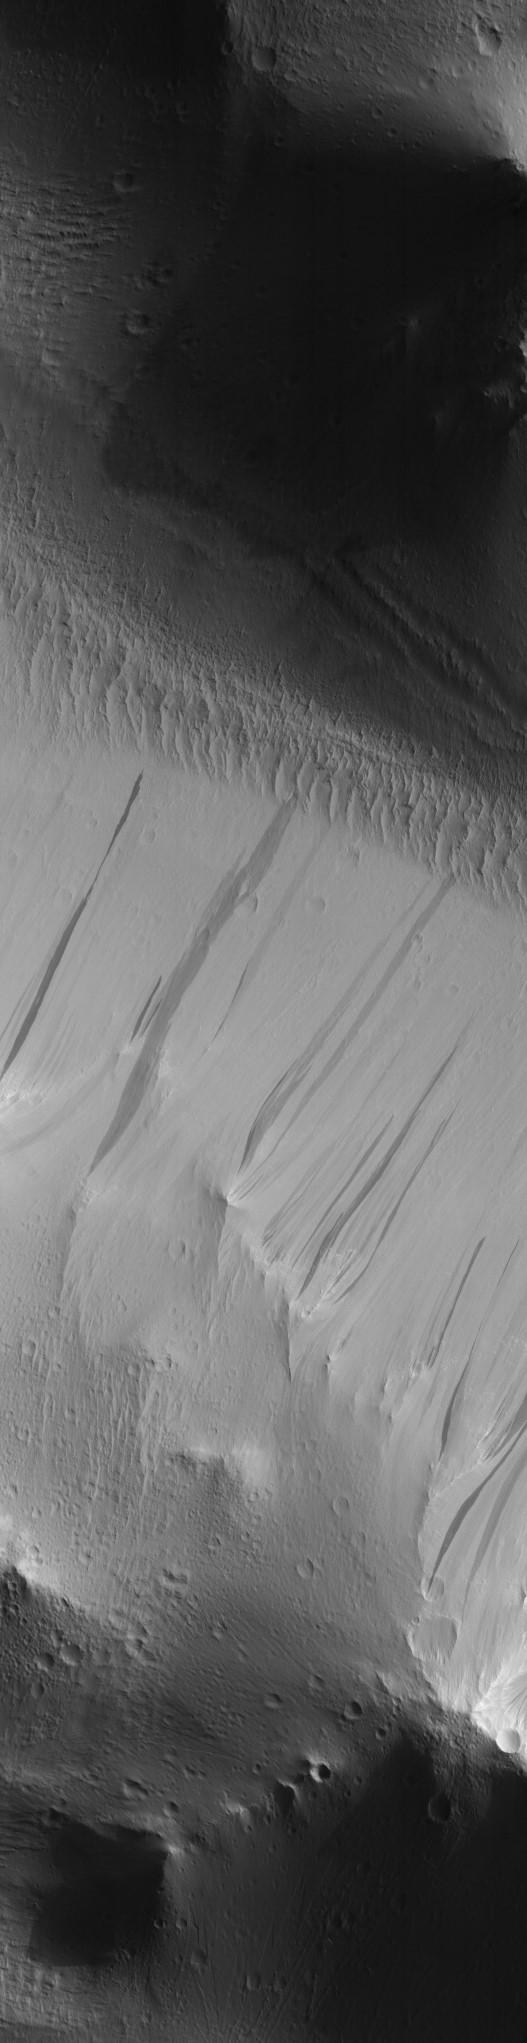 Streaks near Olympus Mons volcanic base. Image credit: HiRISE-ASU